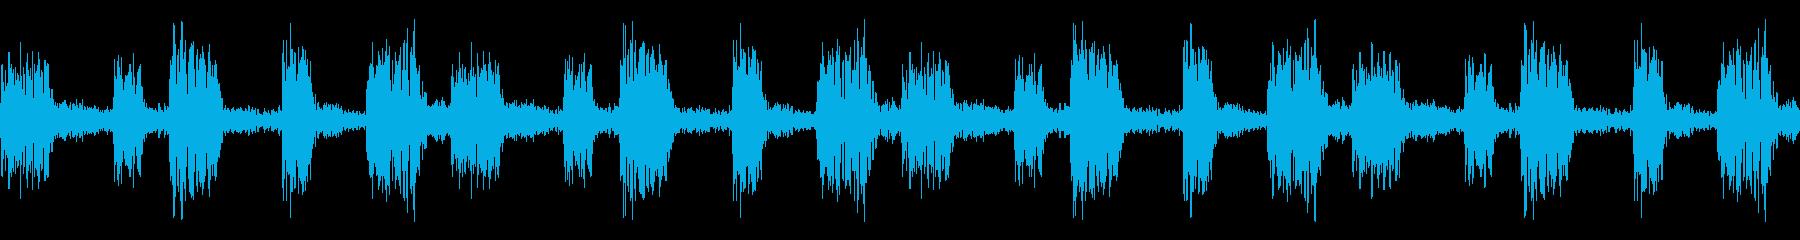 House コードシンセ 1 音楽制作用の再生済みの波形